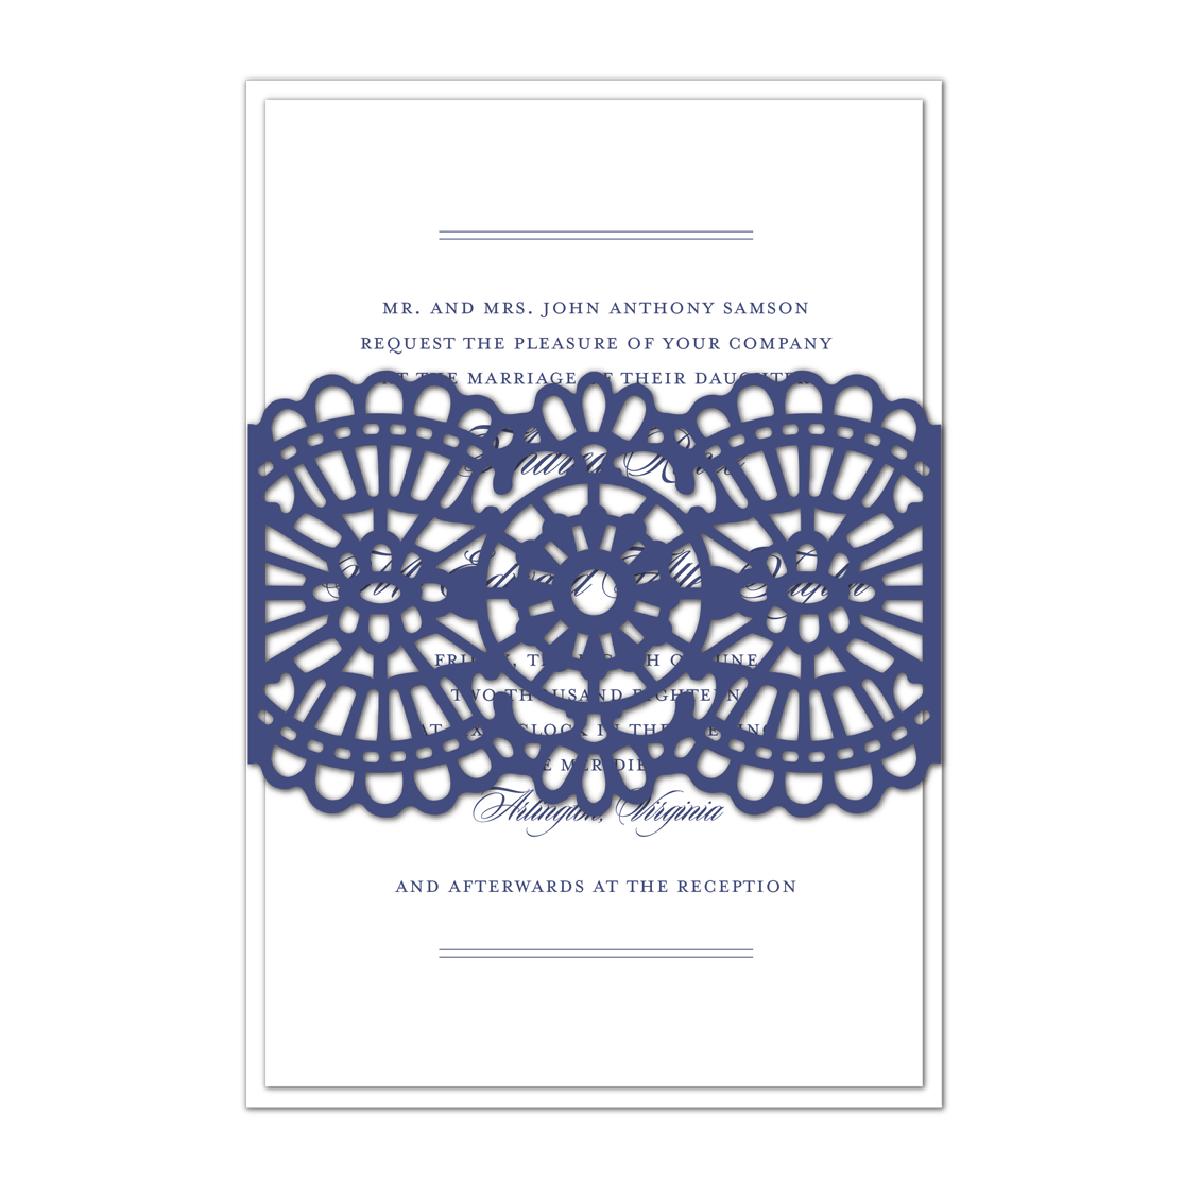 Ivory Lace Vellum Gatefold Invitation